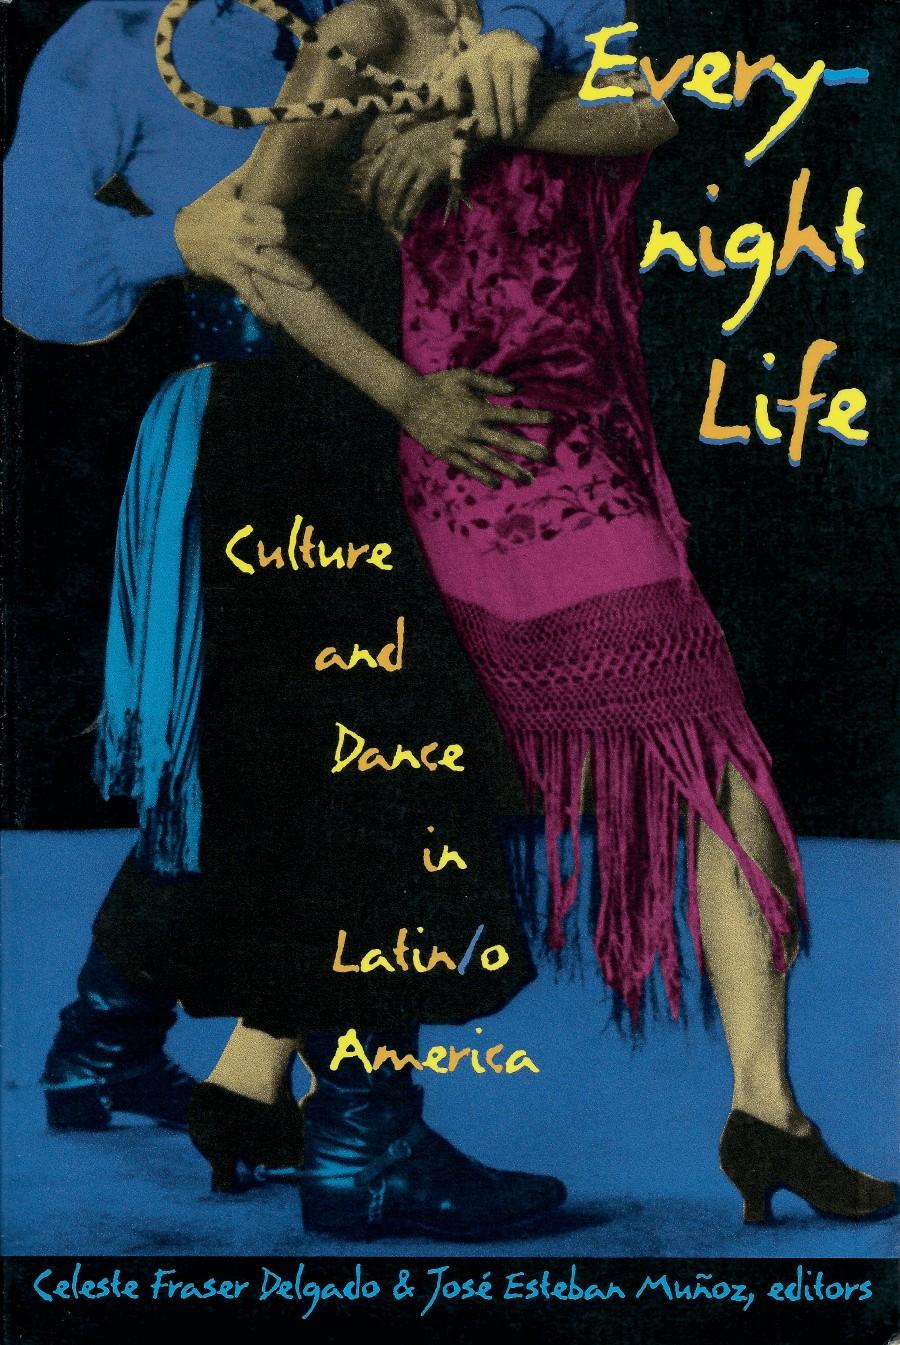 Everynight Life: Culture and Dance in Latin/o America